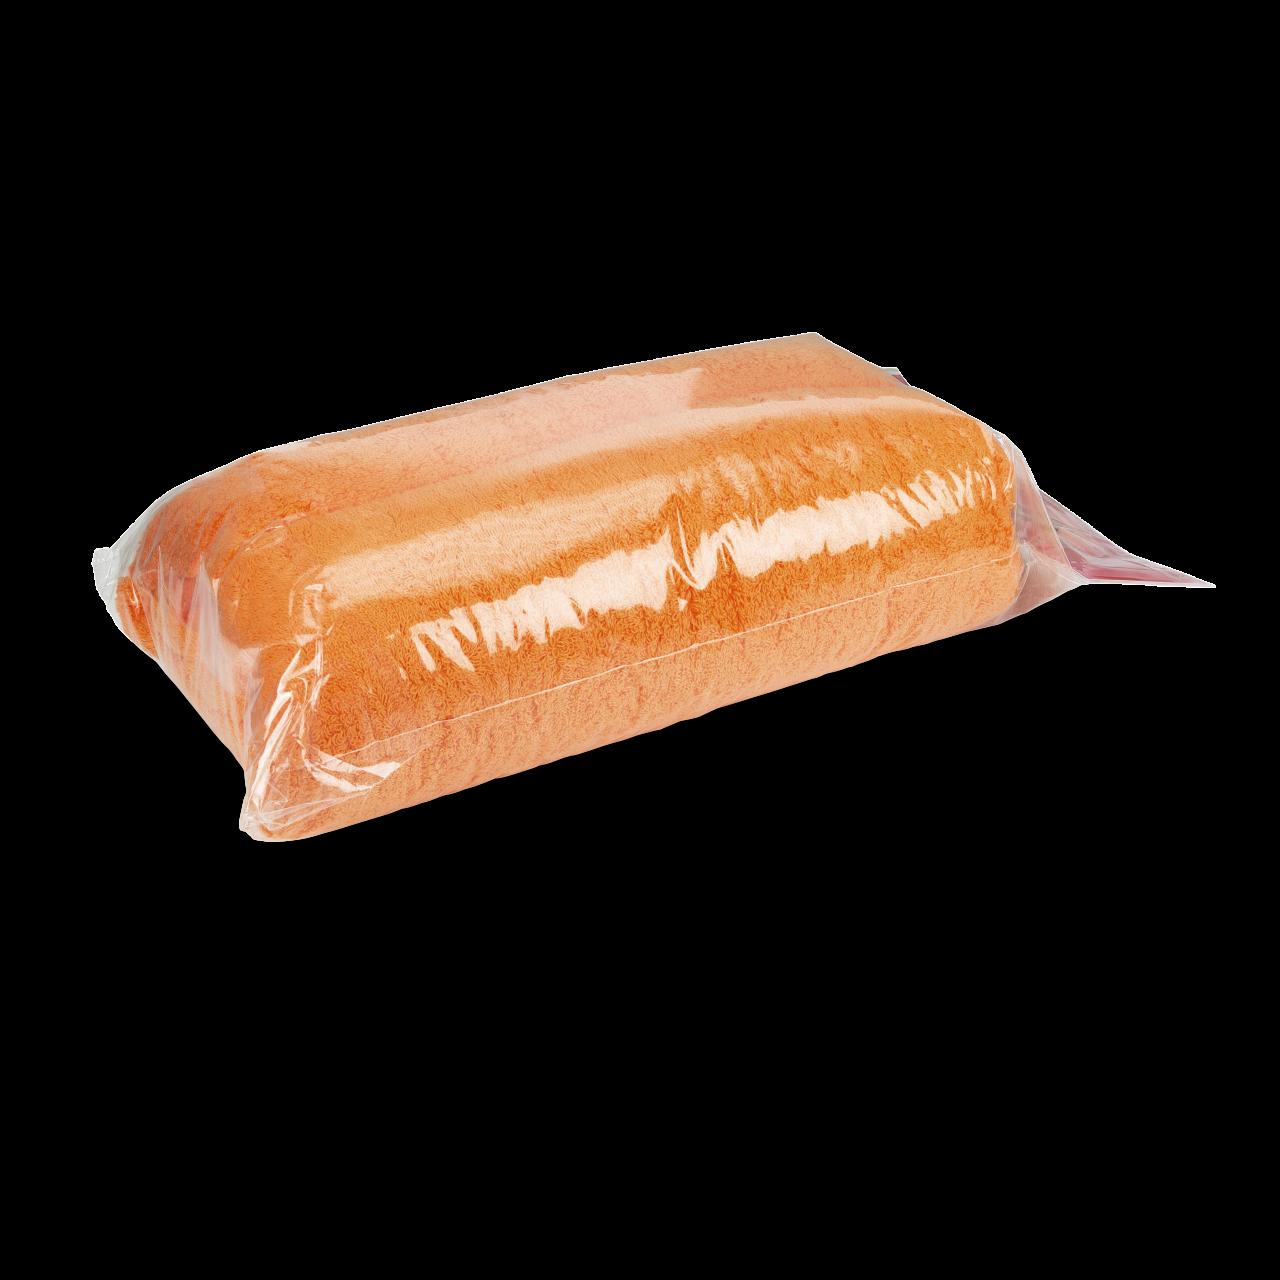 Handtuch Wellness, apricot 180 x 70cm, 1 Stk.